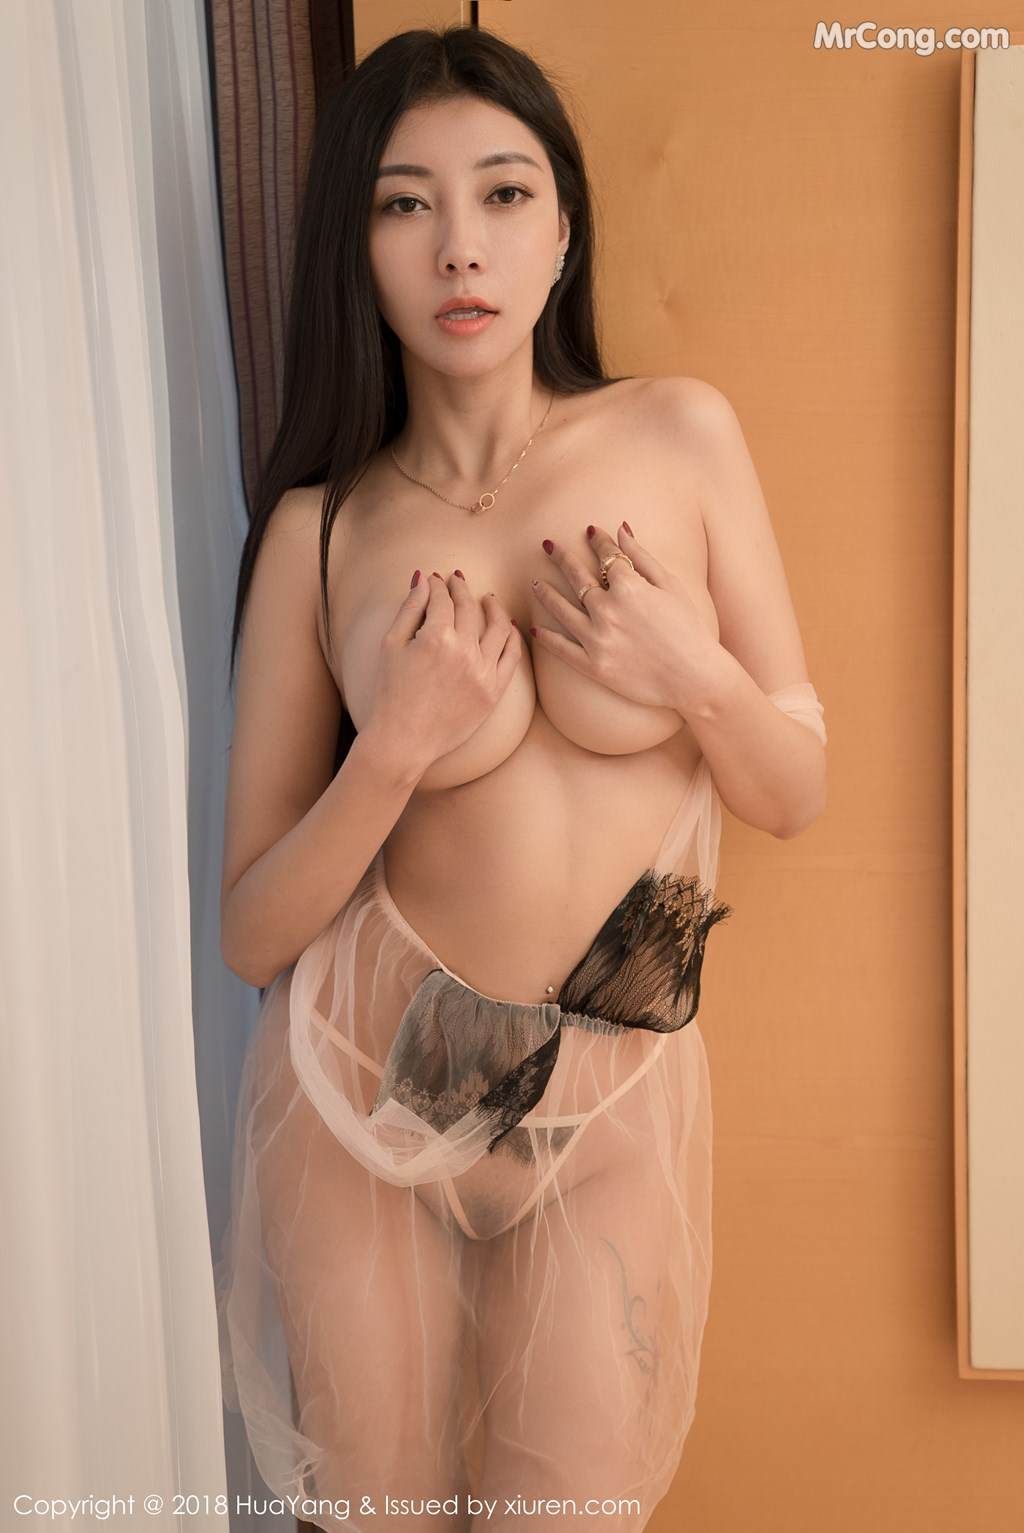 Image HuaYang-2018-01-26-Vol.028-Victoria-Guo-Er-MrCong.com-011 in post HuaYang 2018-01-26 Vol.028: Người mẫu Victoria (果儿) (41 ảnh)